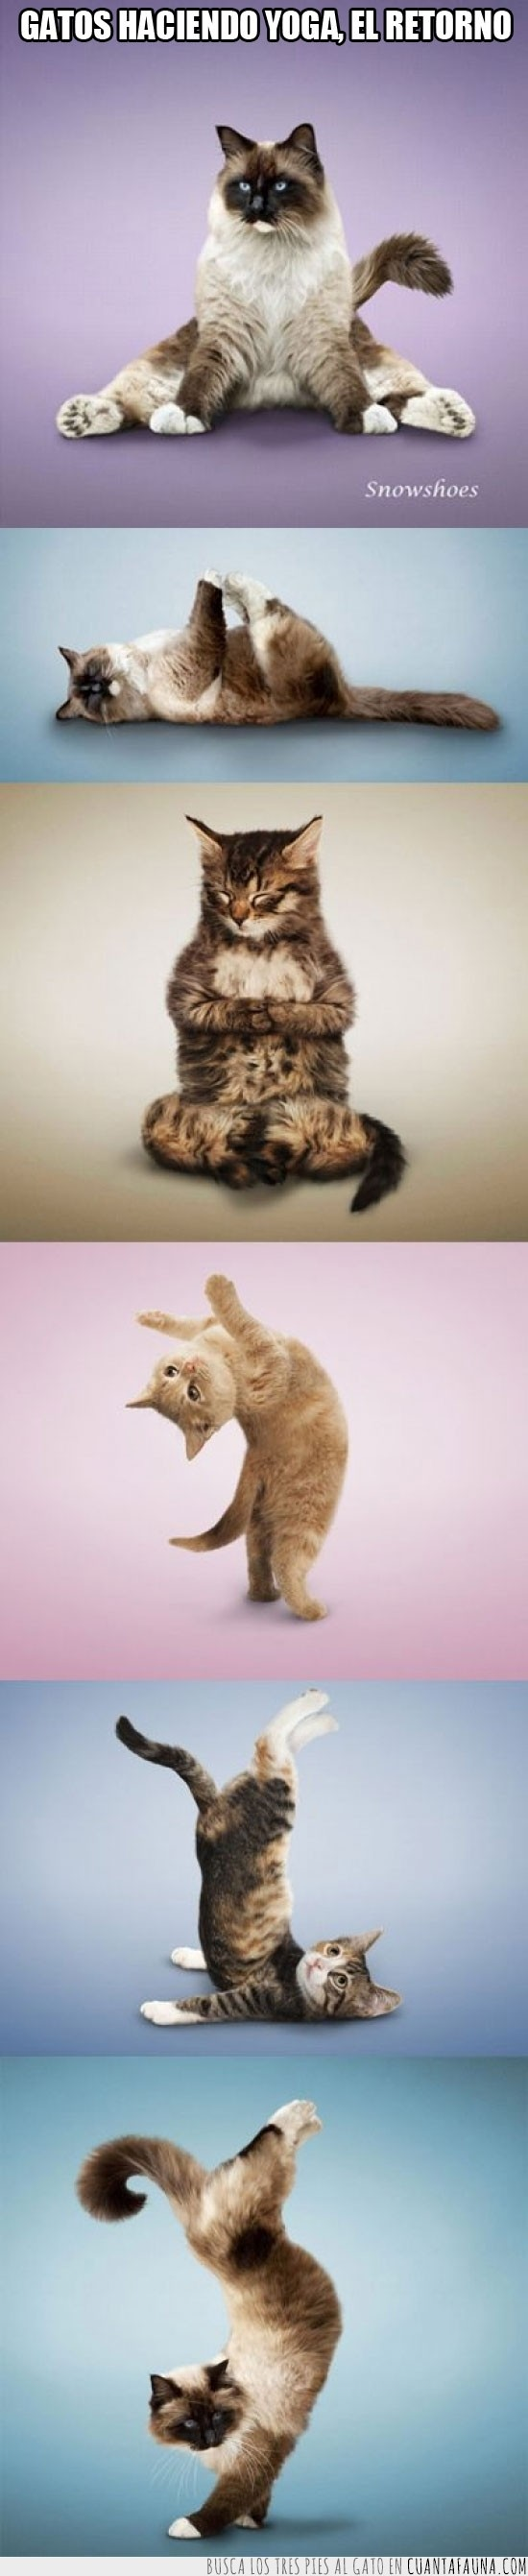 el retorno,gato,gatos,yoga,yoga cat